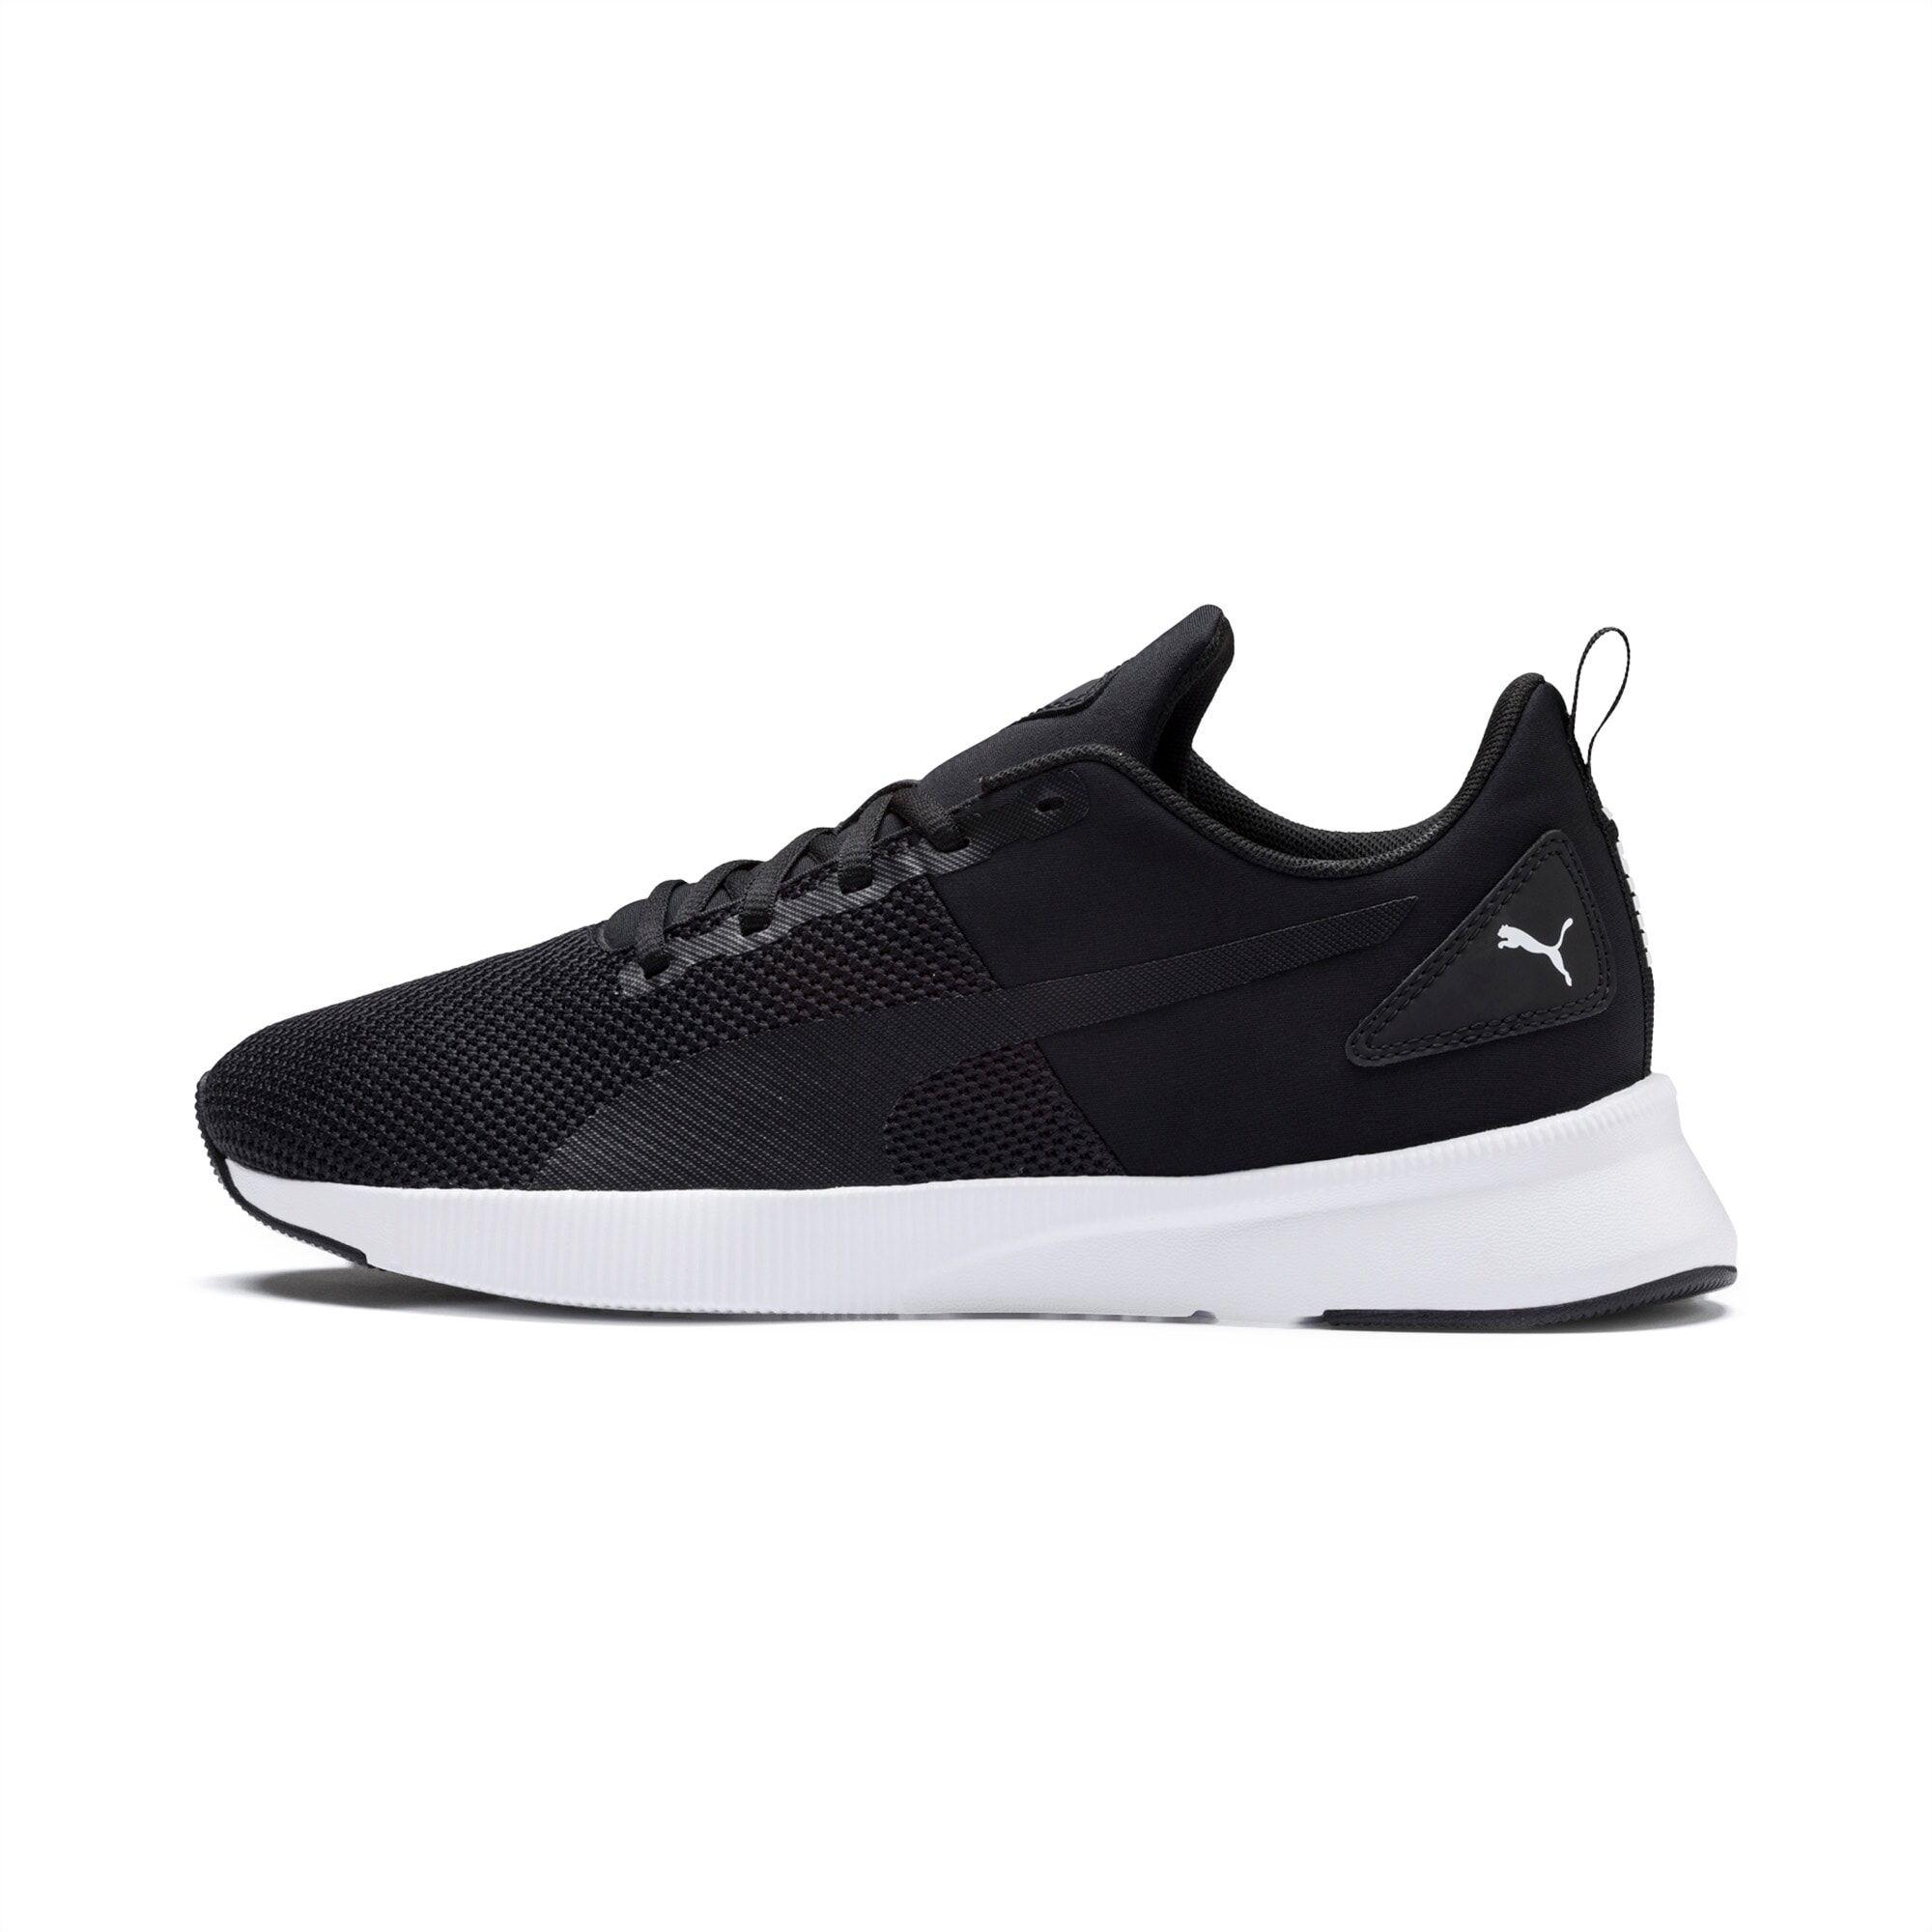 PUMA Chaussure de course Flyer Runner, Noir/Blanc, Taille 41, Chaussures